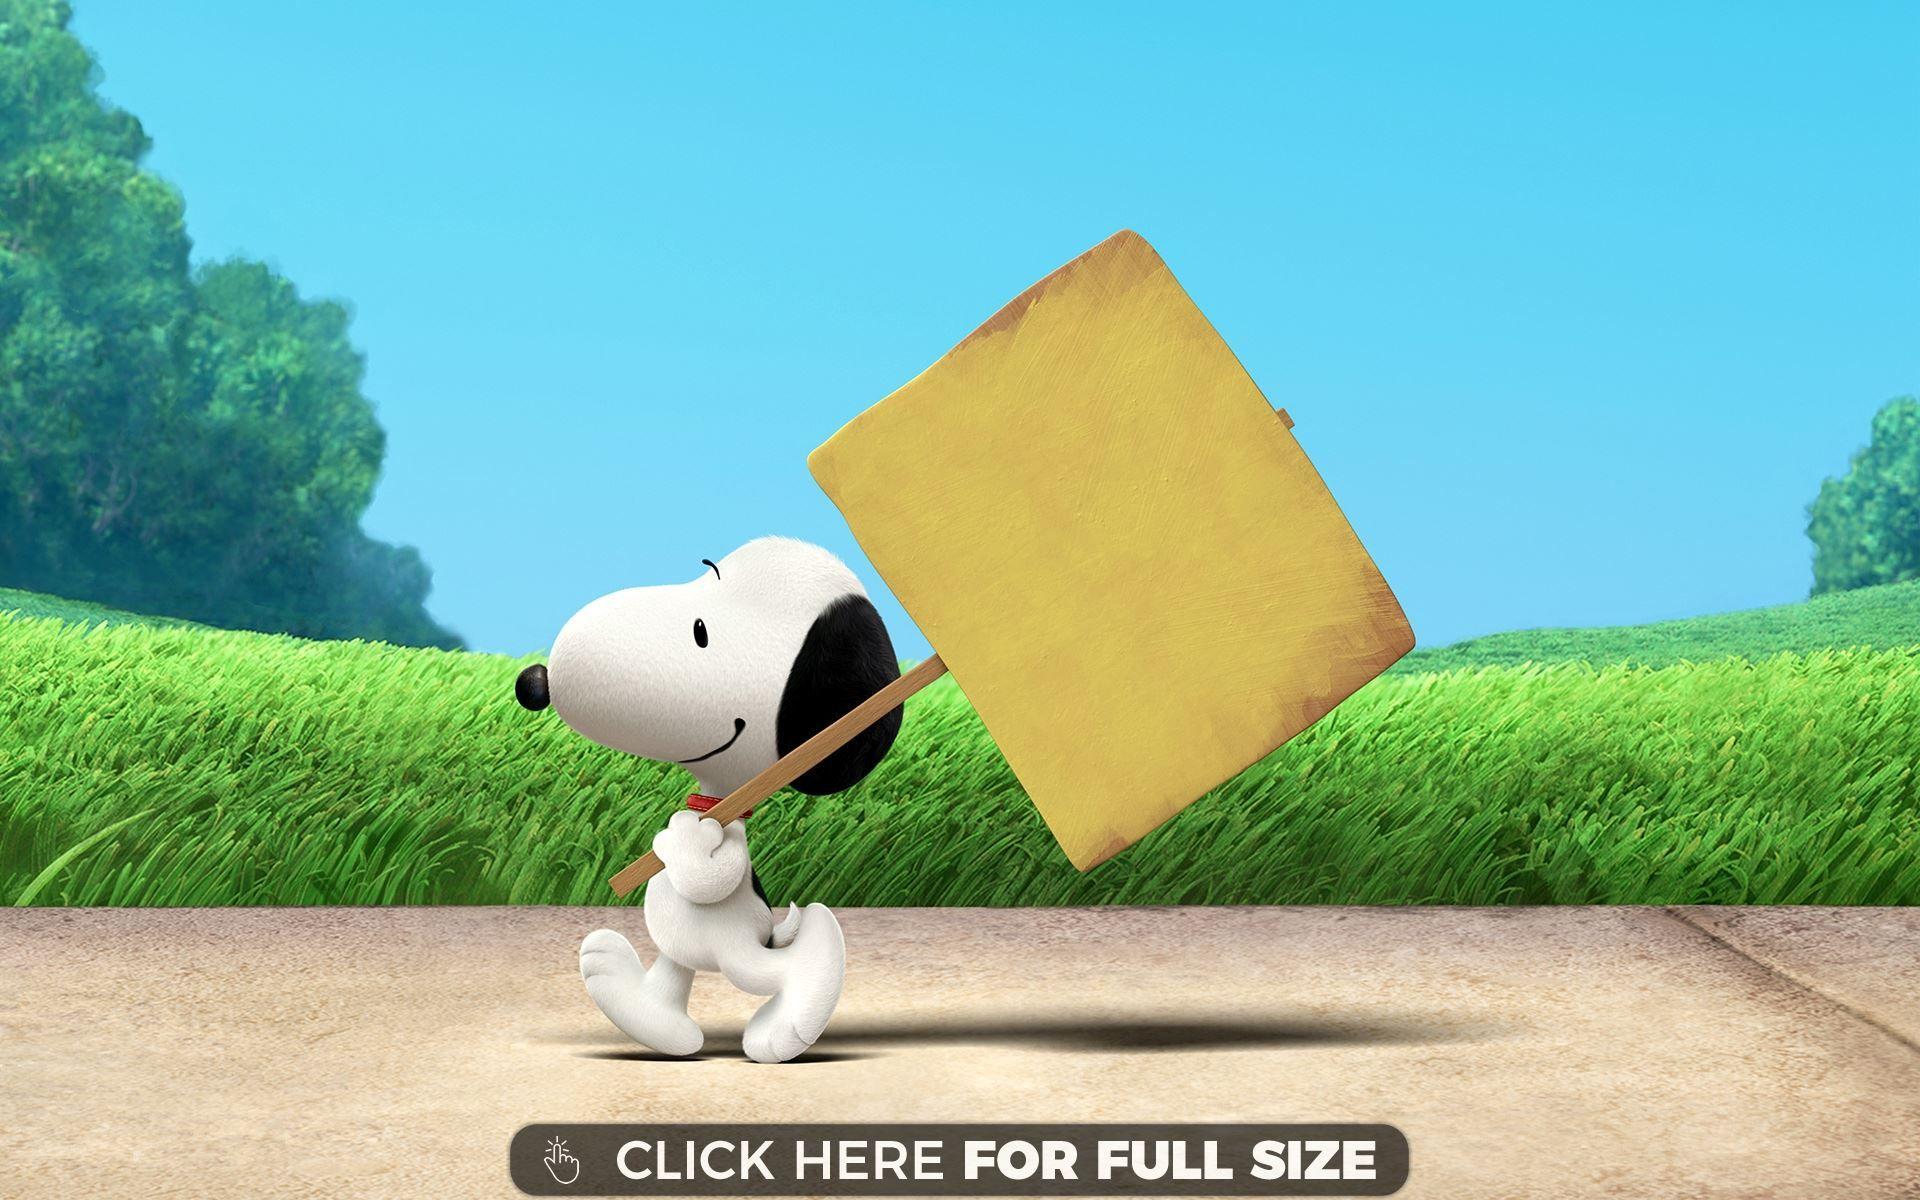 Snoopy The Peanuts Movie Desktop Wallpapers Pinterest Snoopy